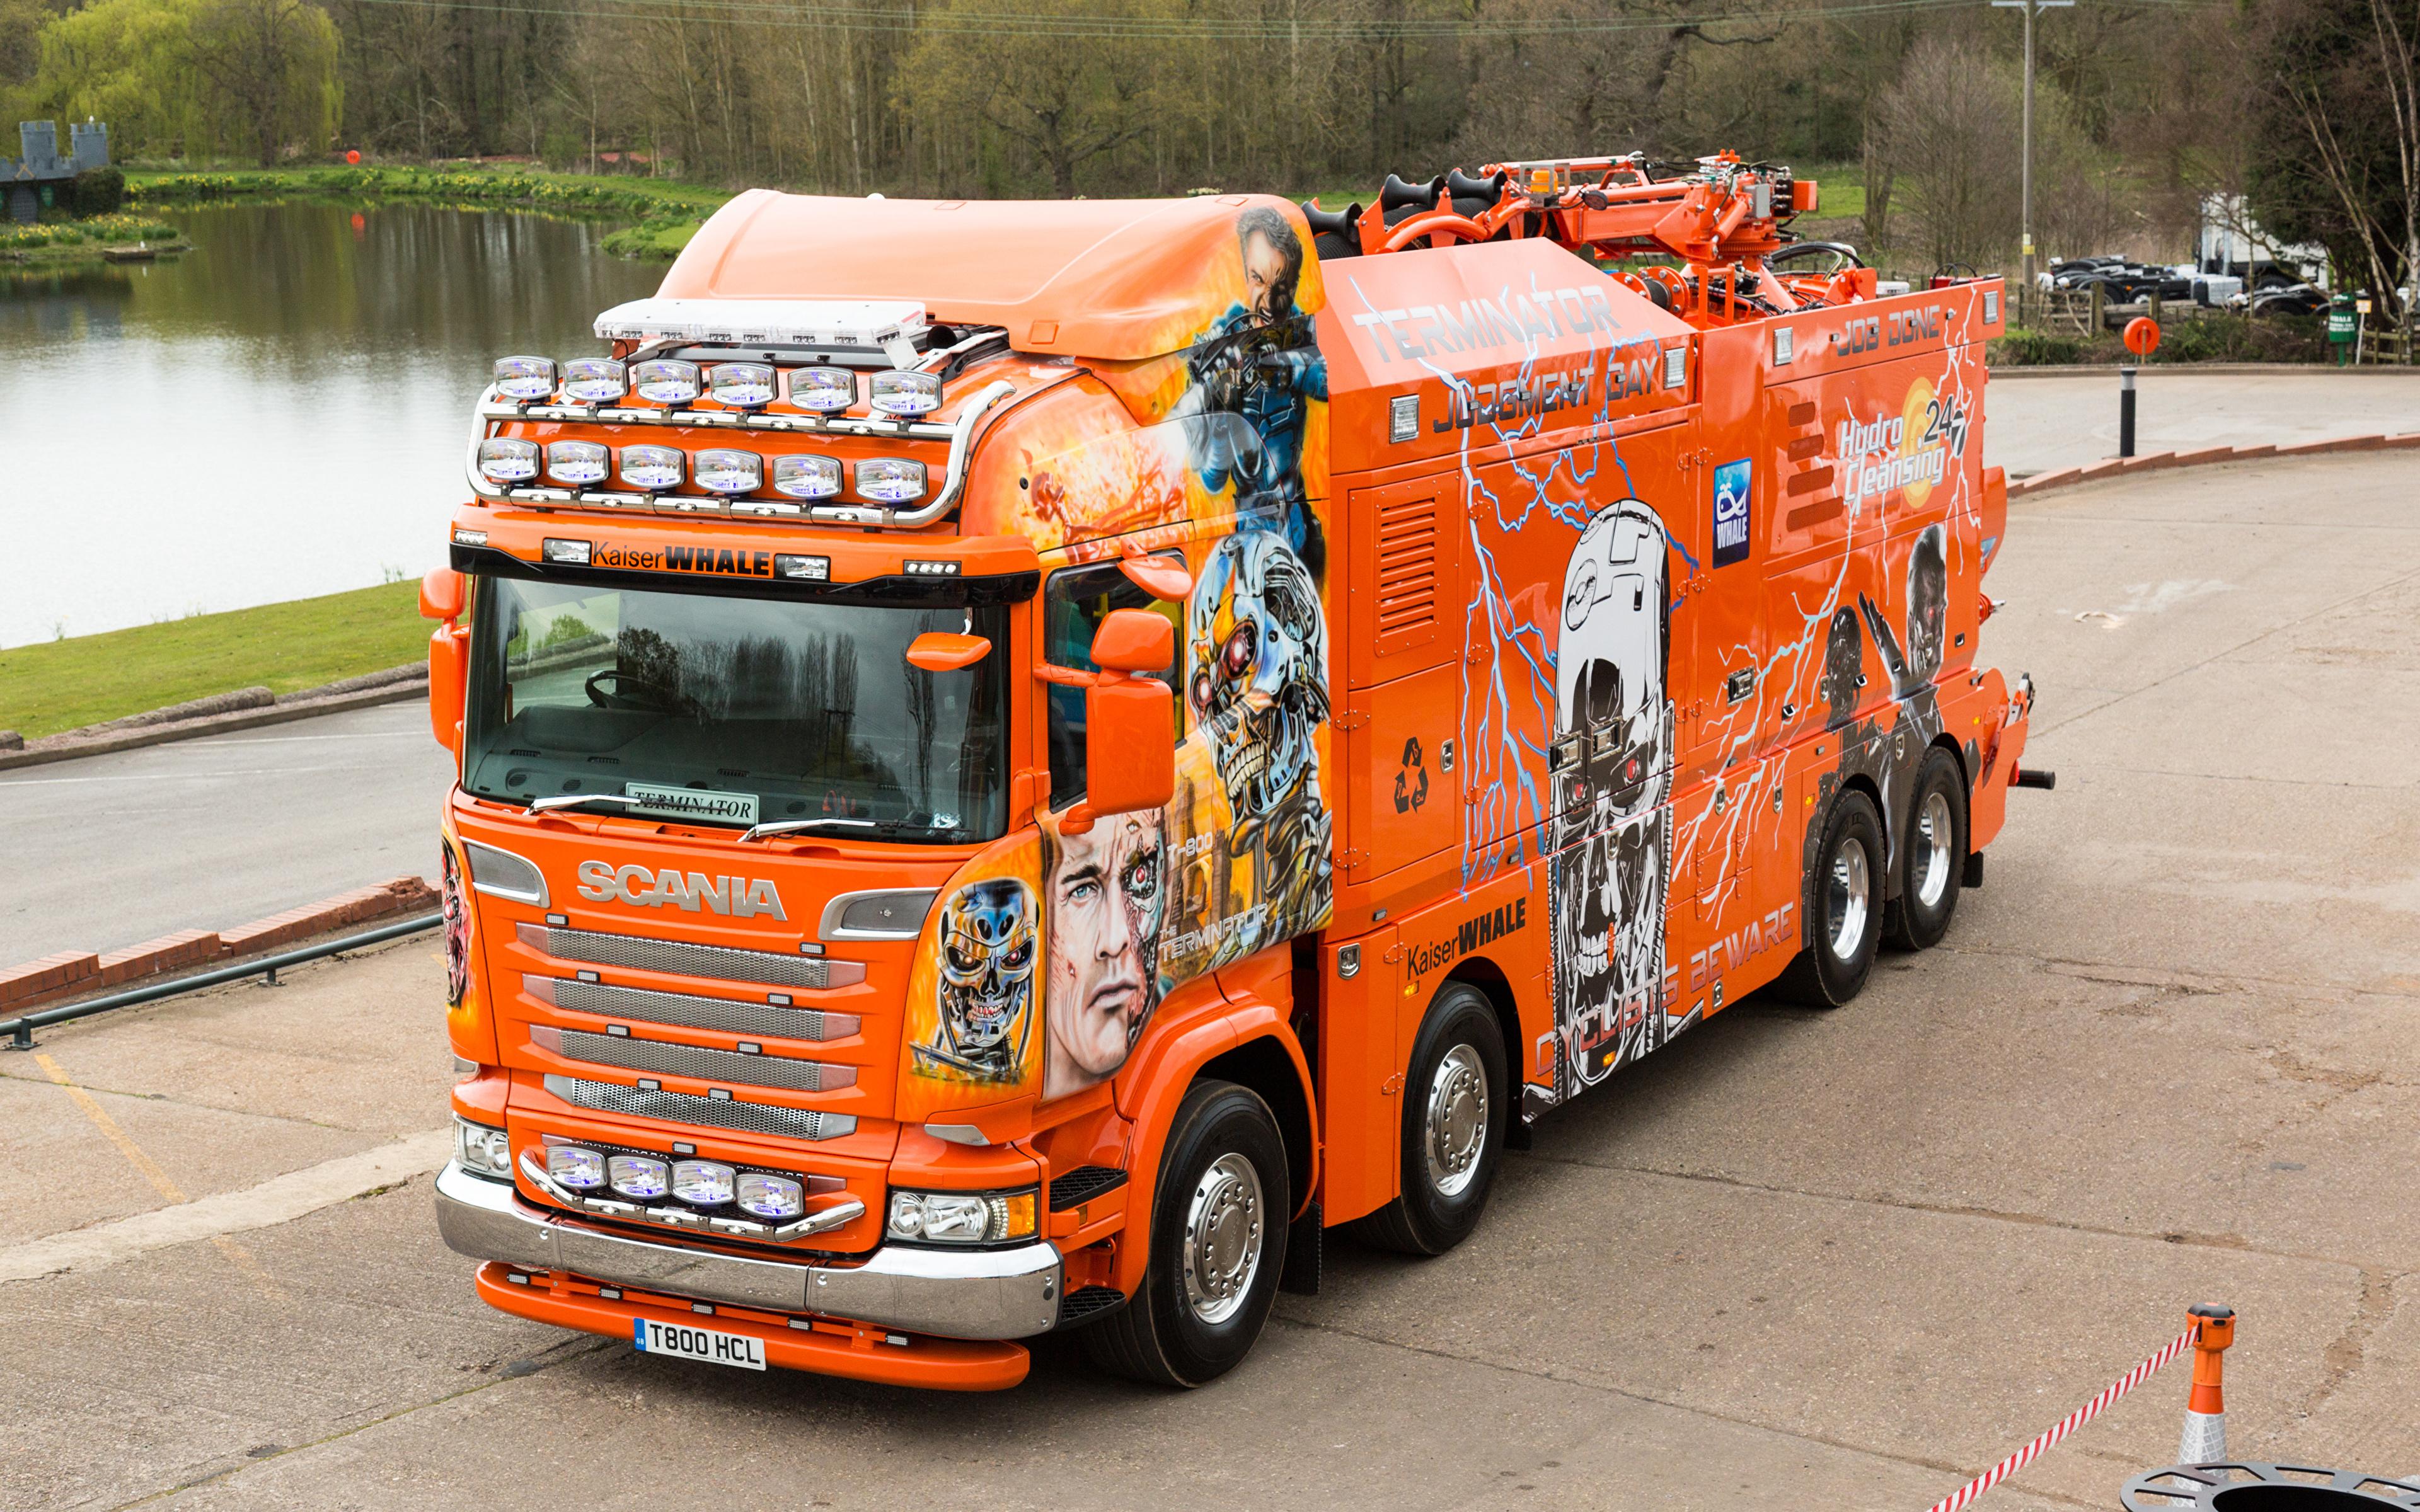 Photos Scania Tuning Trucks 2016 R730 Highline  Terminator Orange Cars 3840x2400